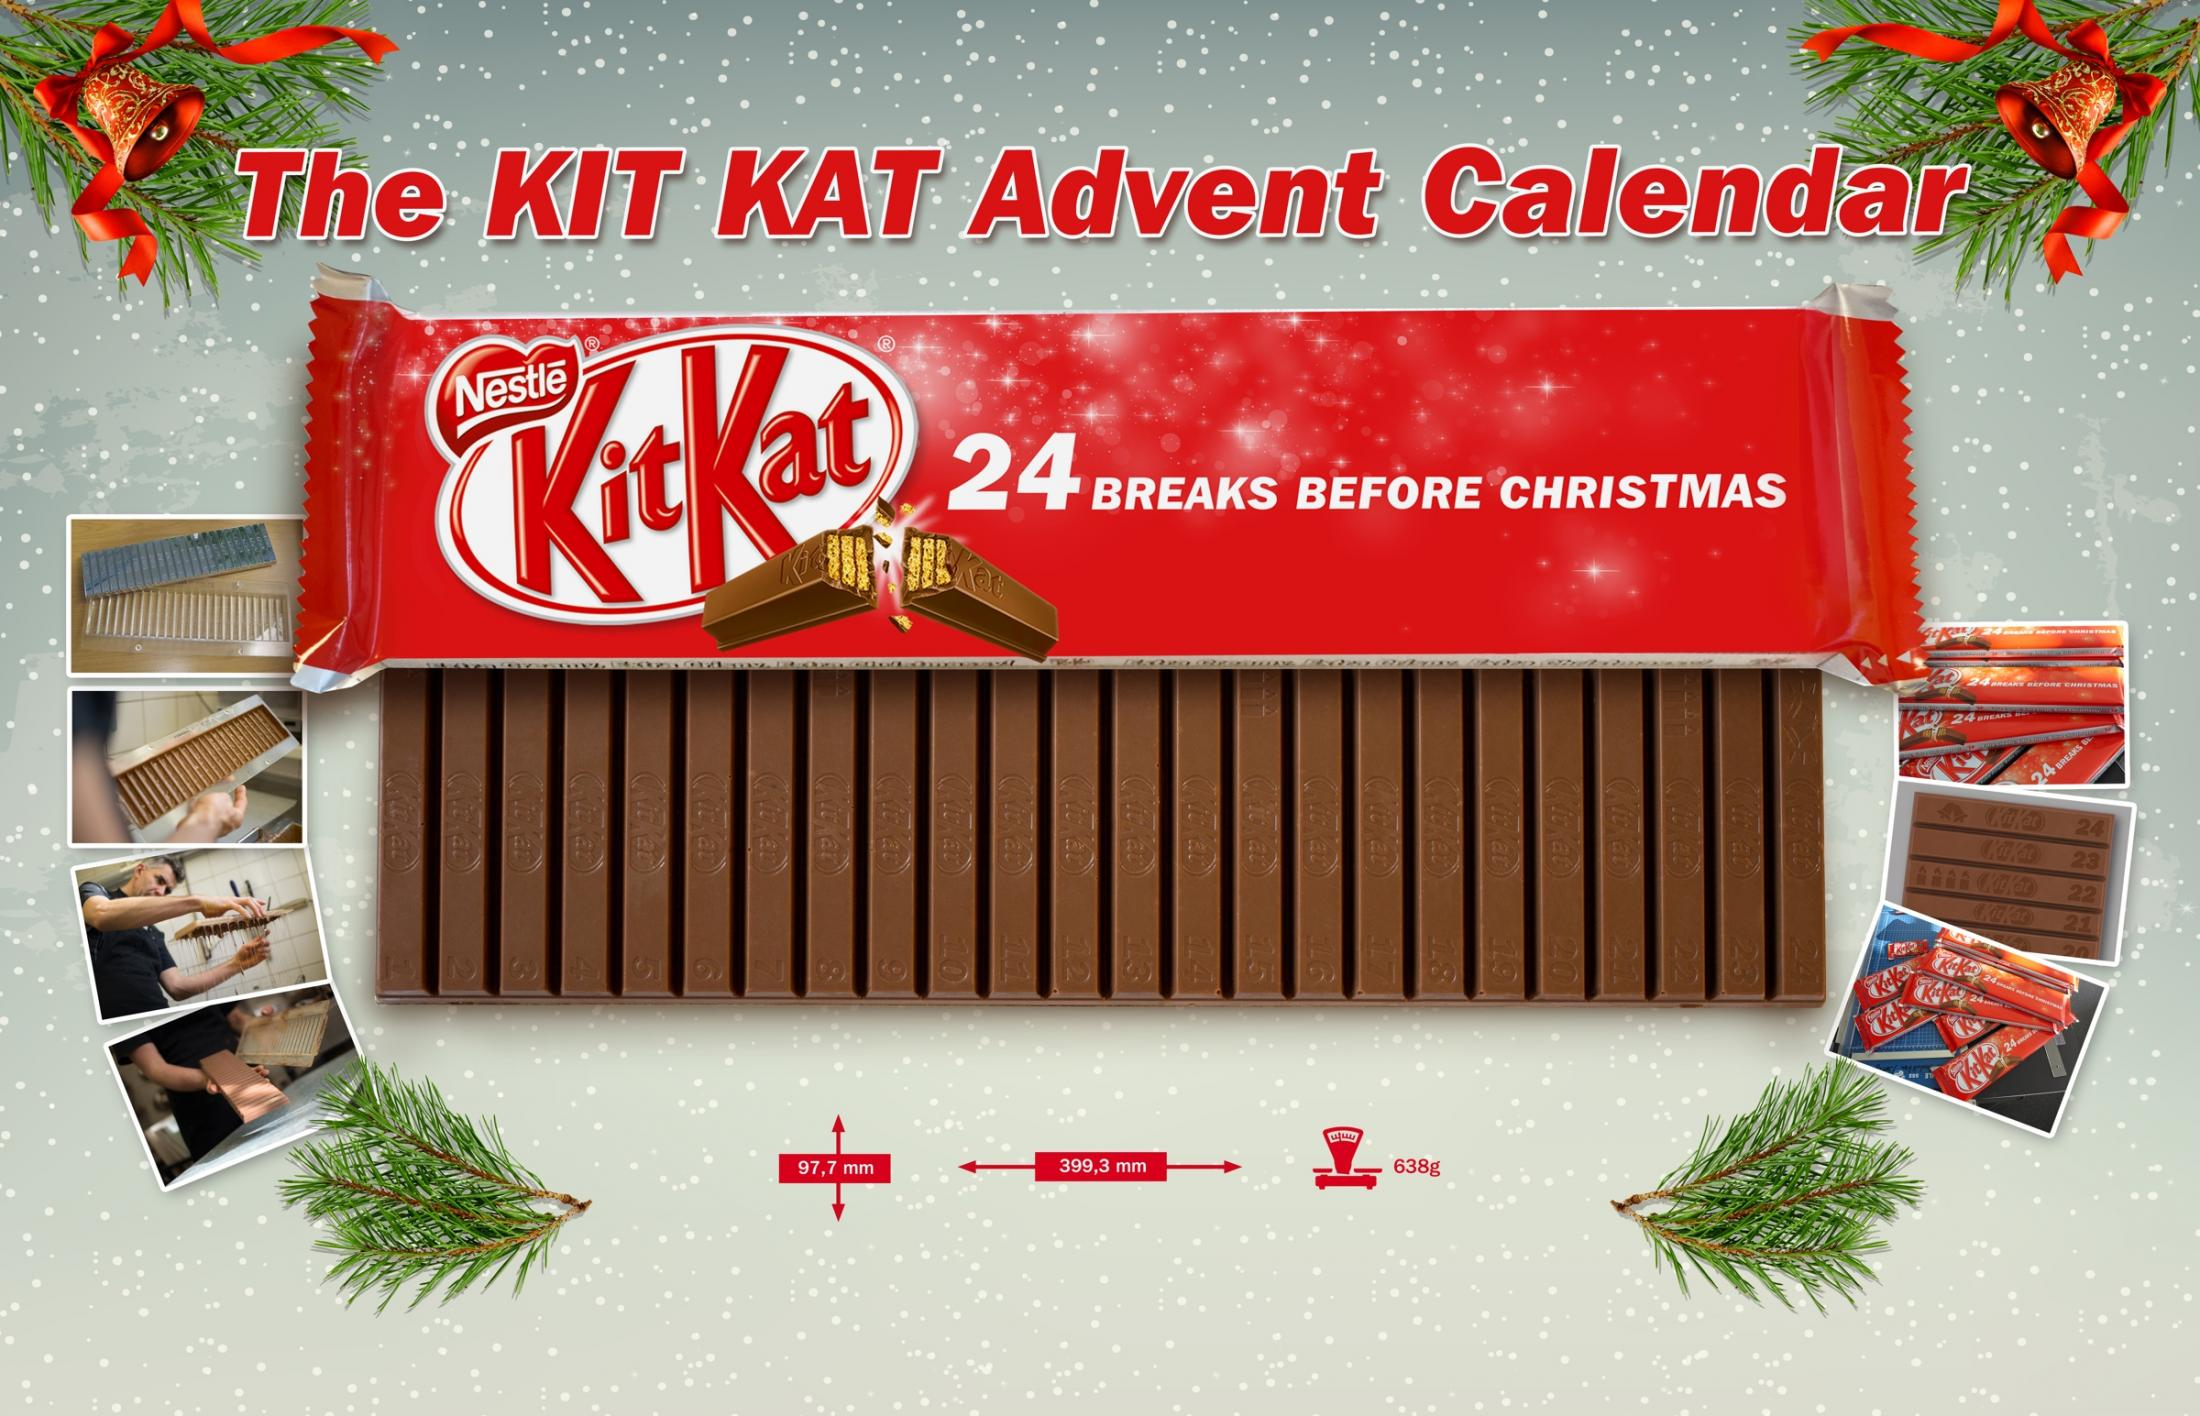 Kit Kat Direct Ad -  Kit Kat Advent Calendar